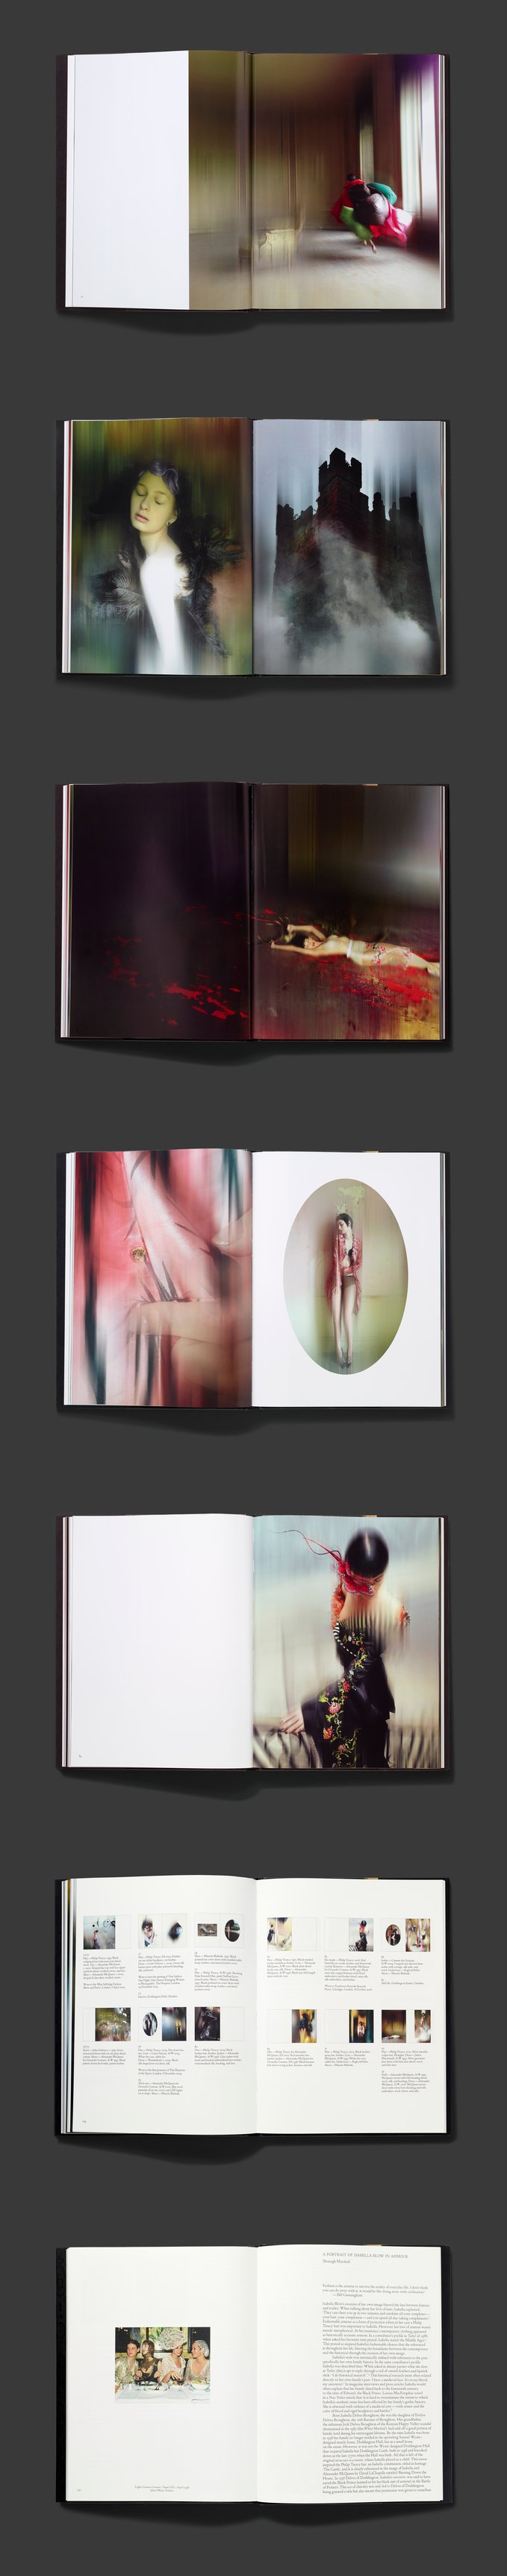 Somerset House/Rizzoli – Isabella Blow: Fashion Galore!, 2013 (Publication), image 5